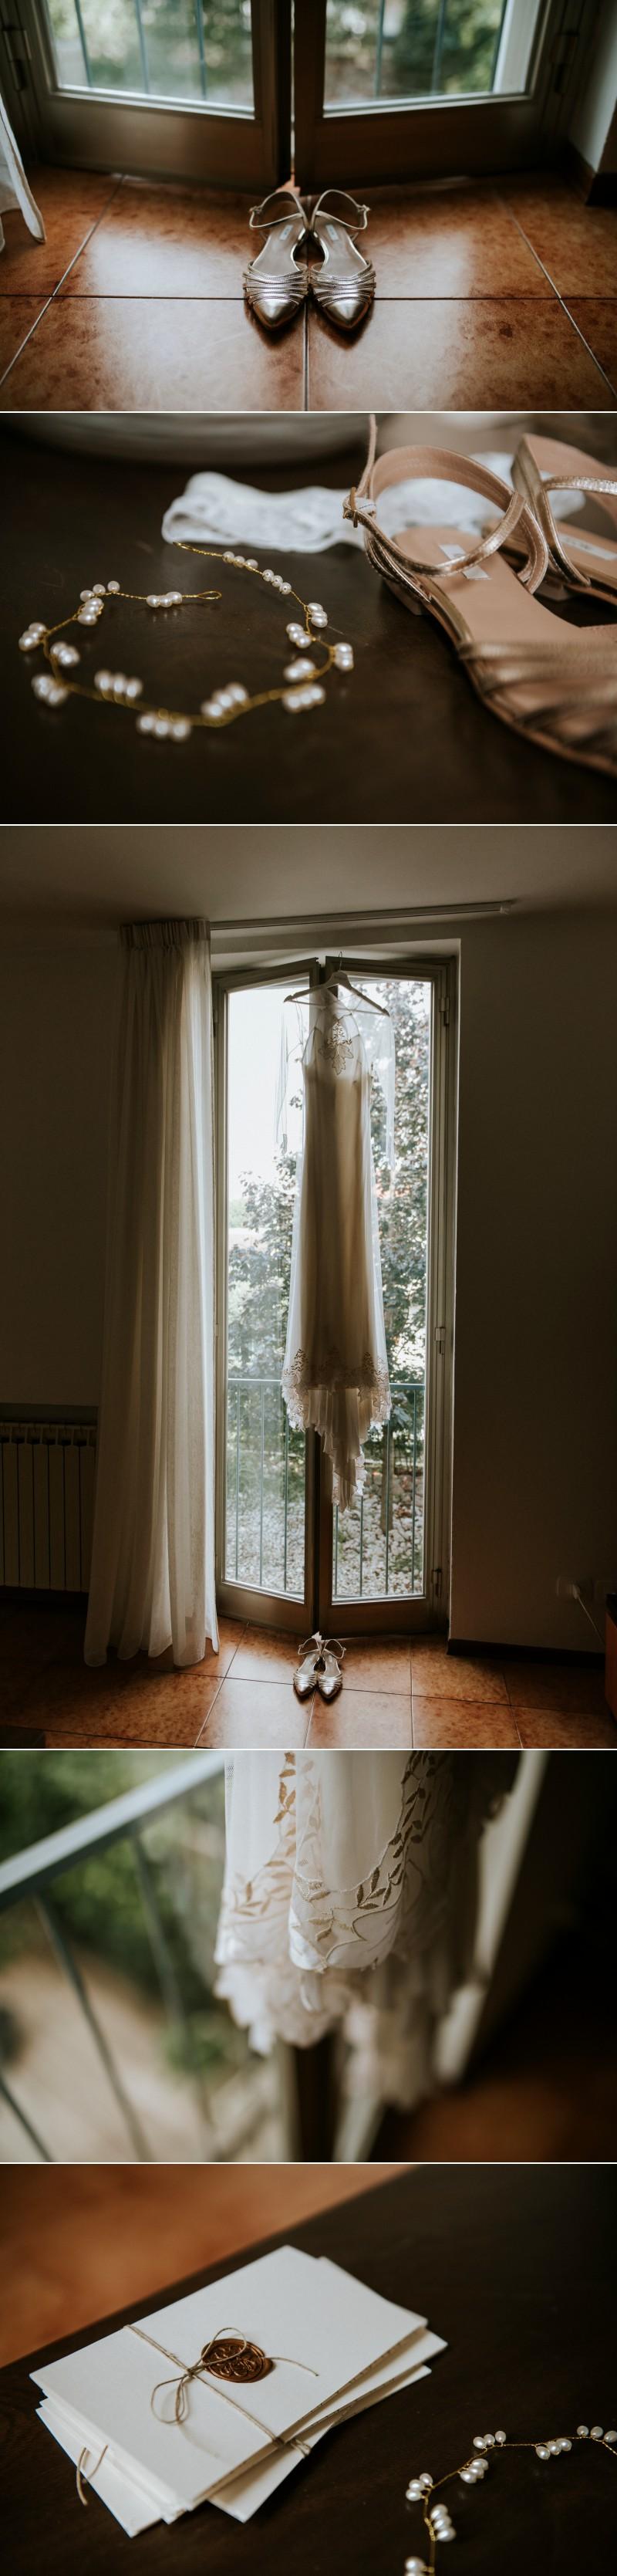 Bologna Ravenna Destination Wedding Photographer